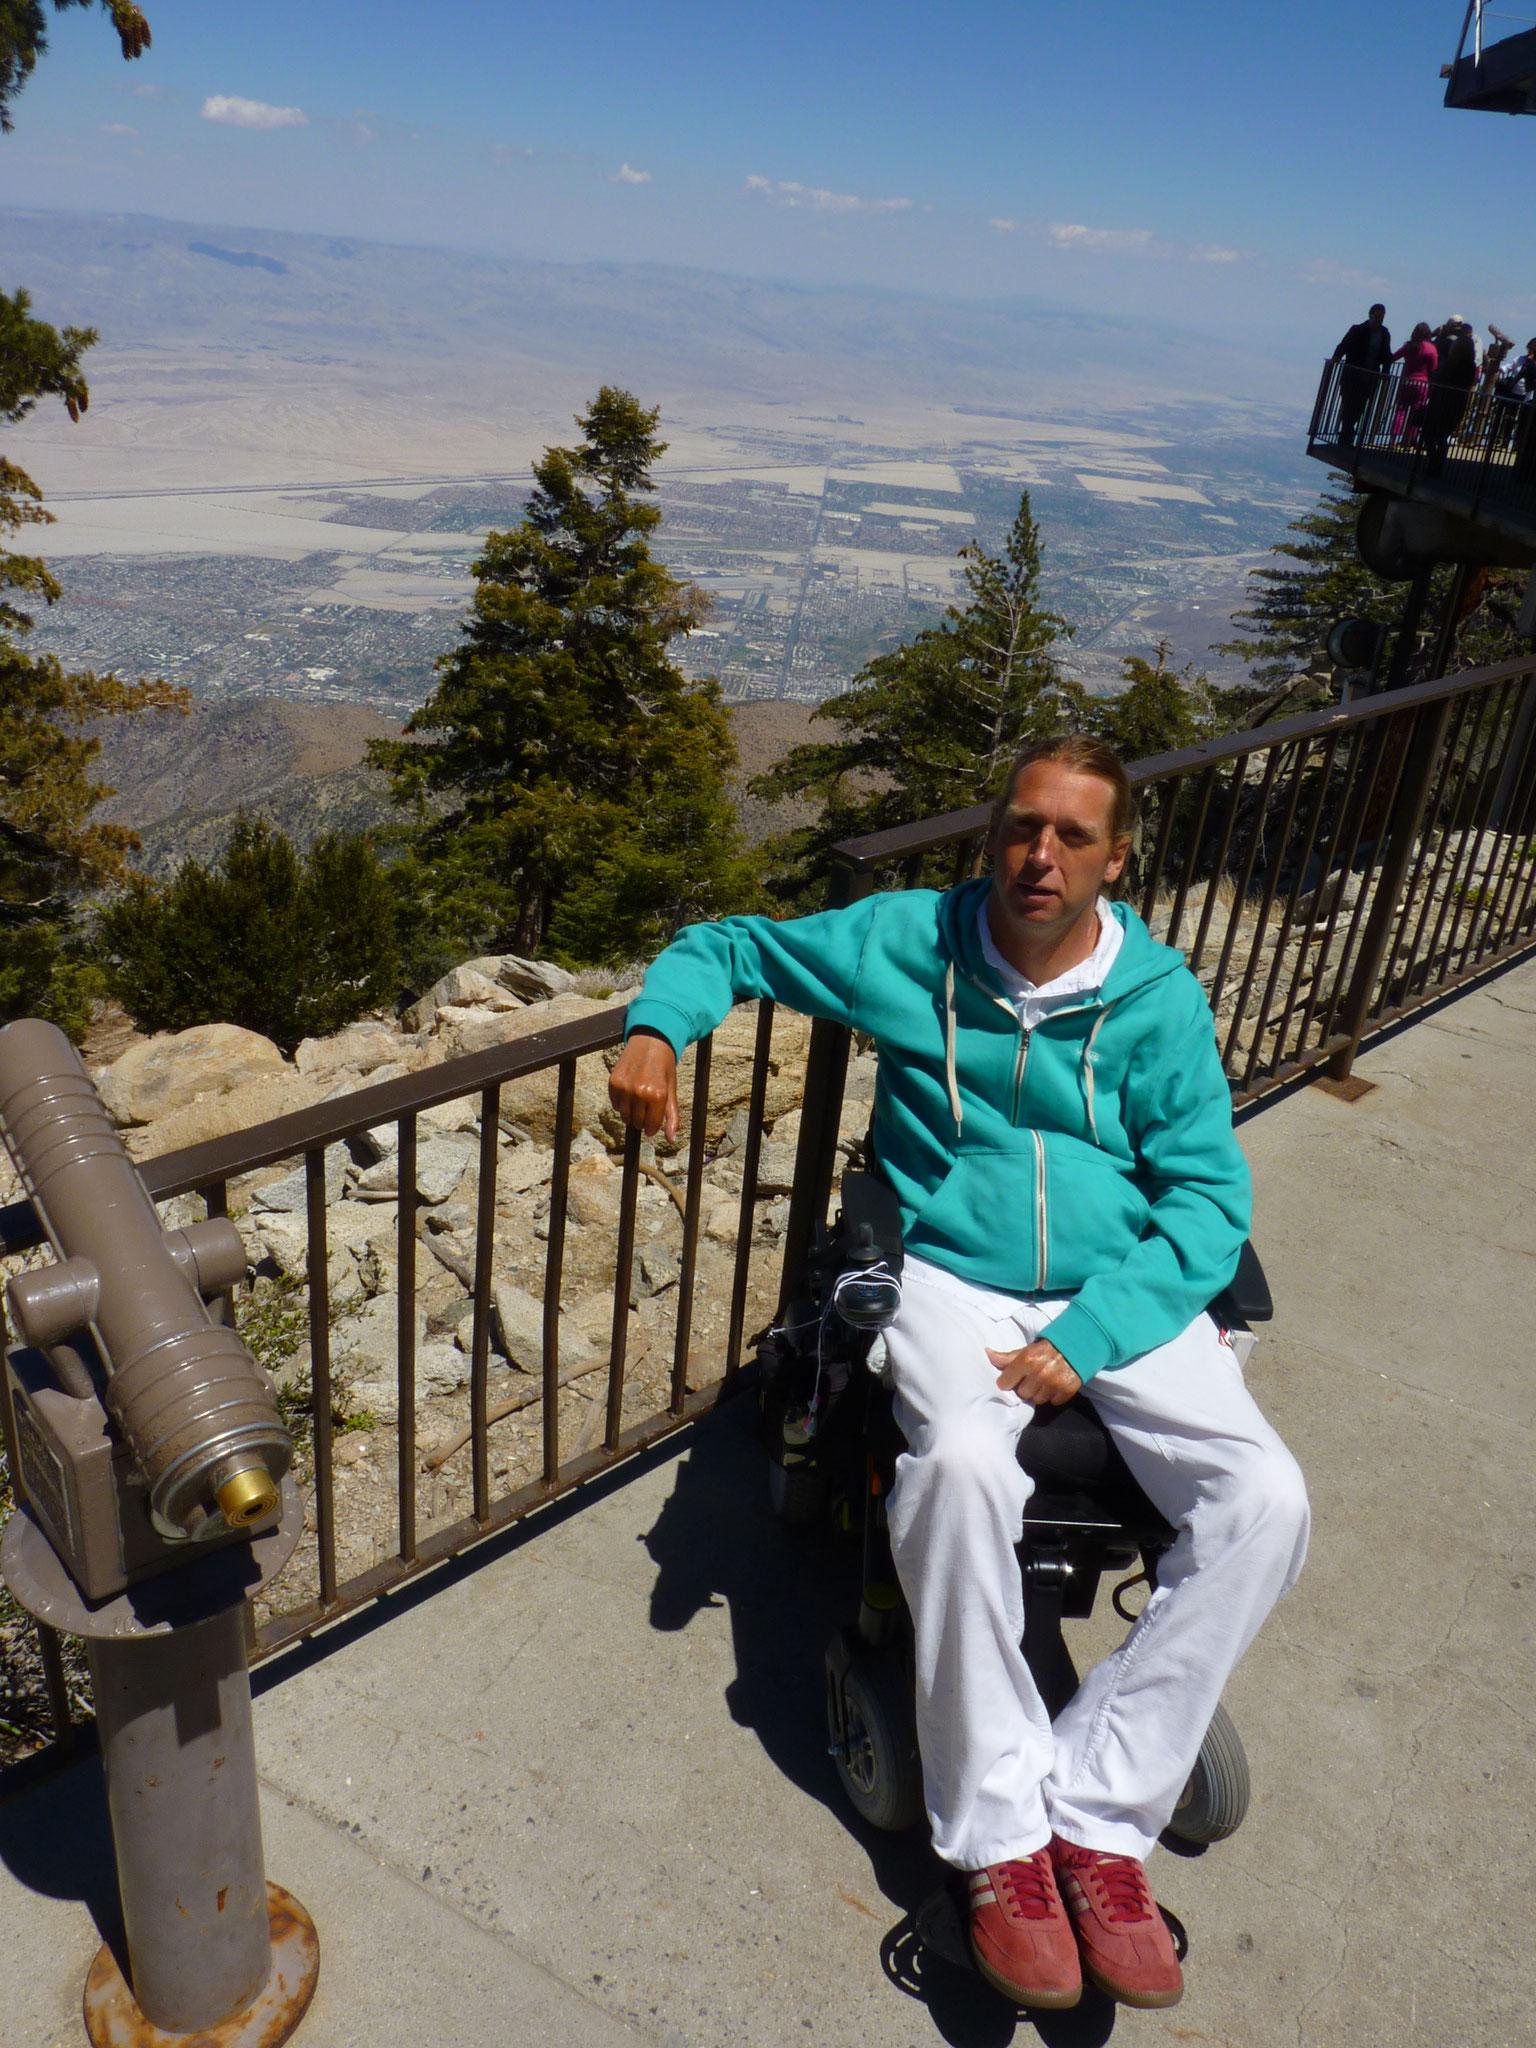 Vue sur la vallée de Coachella